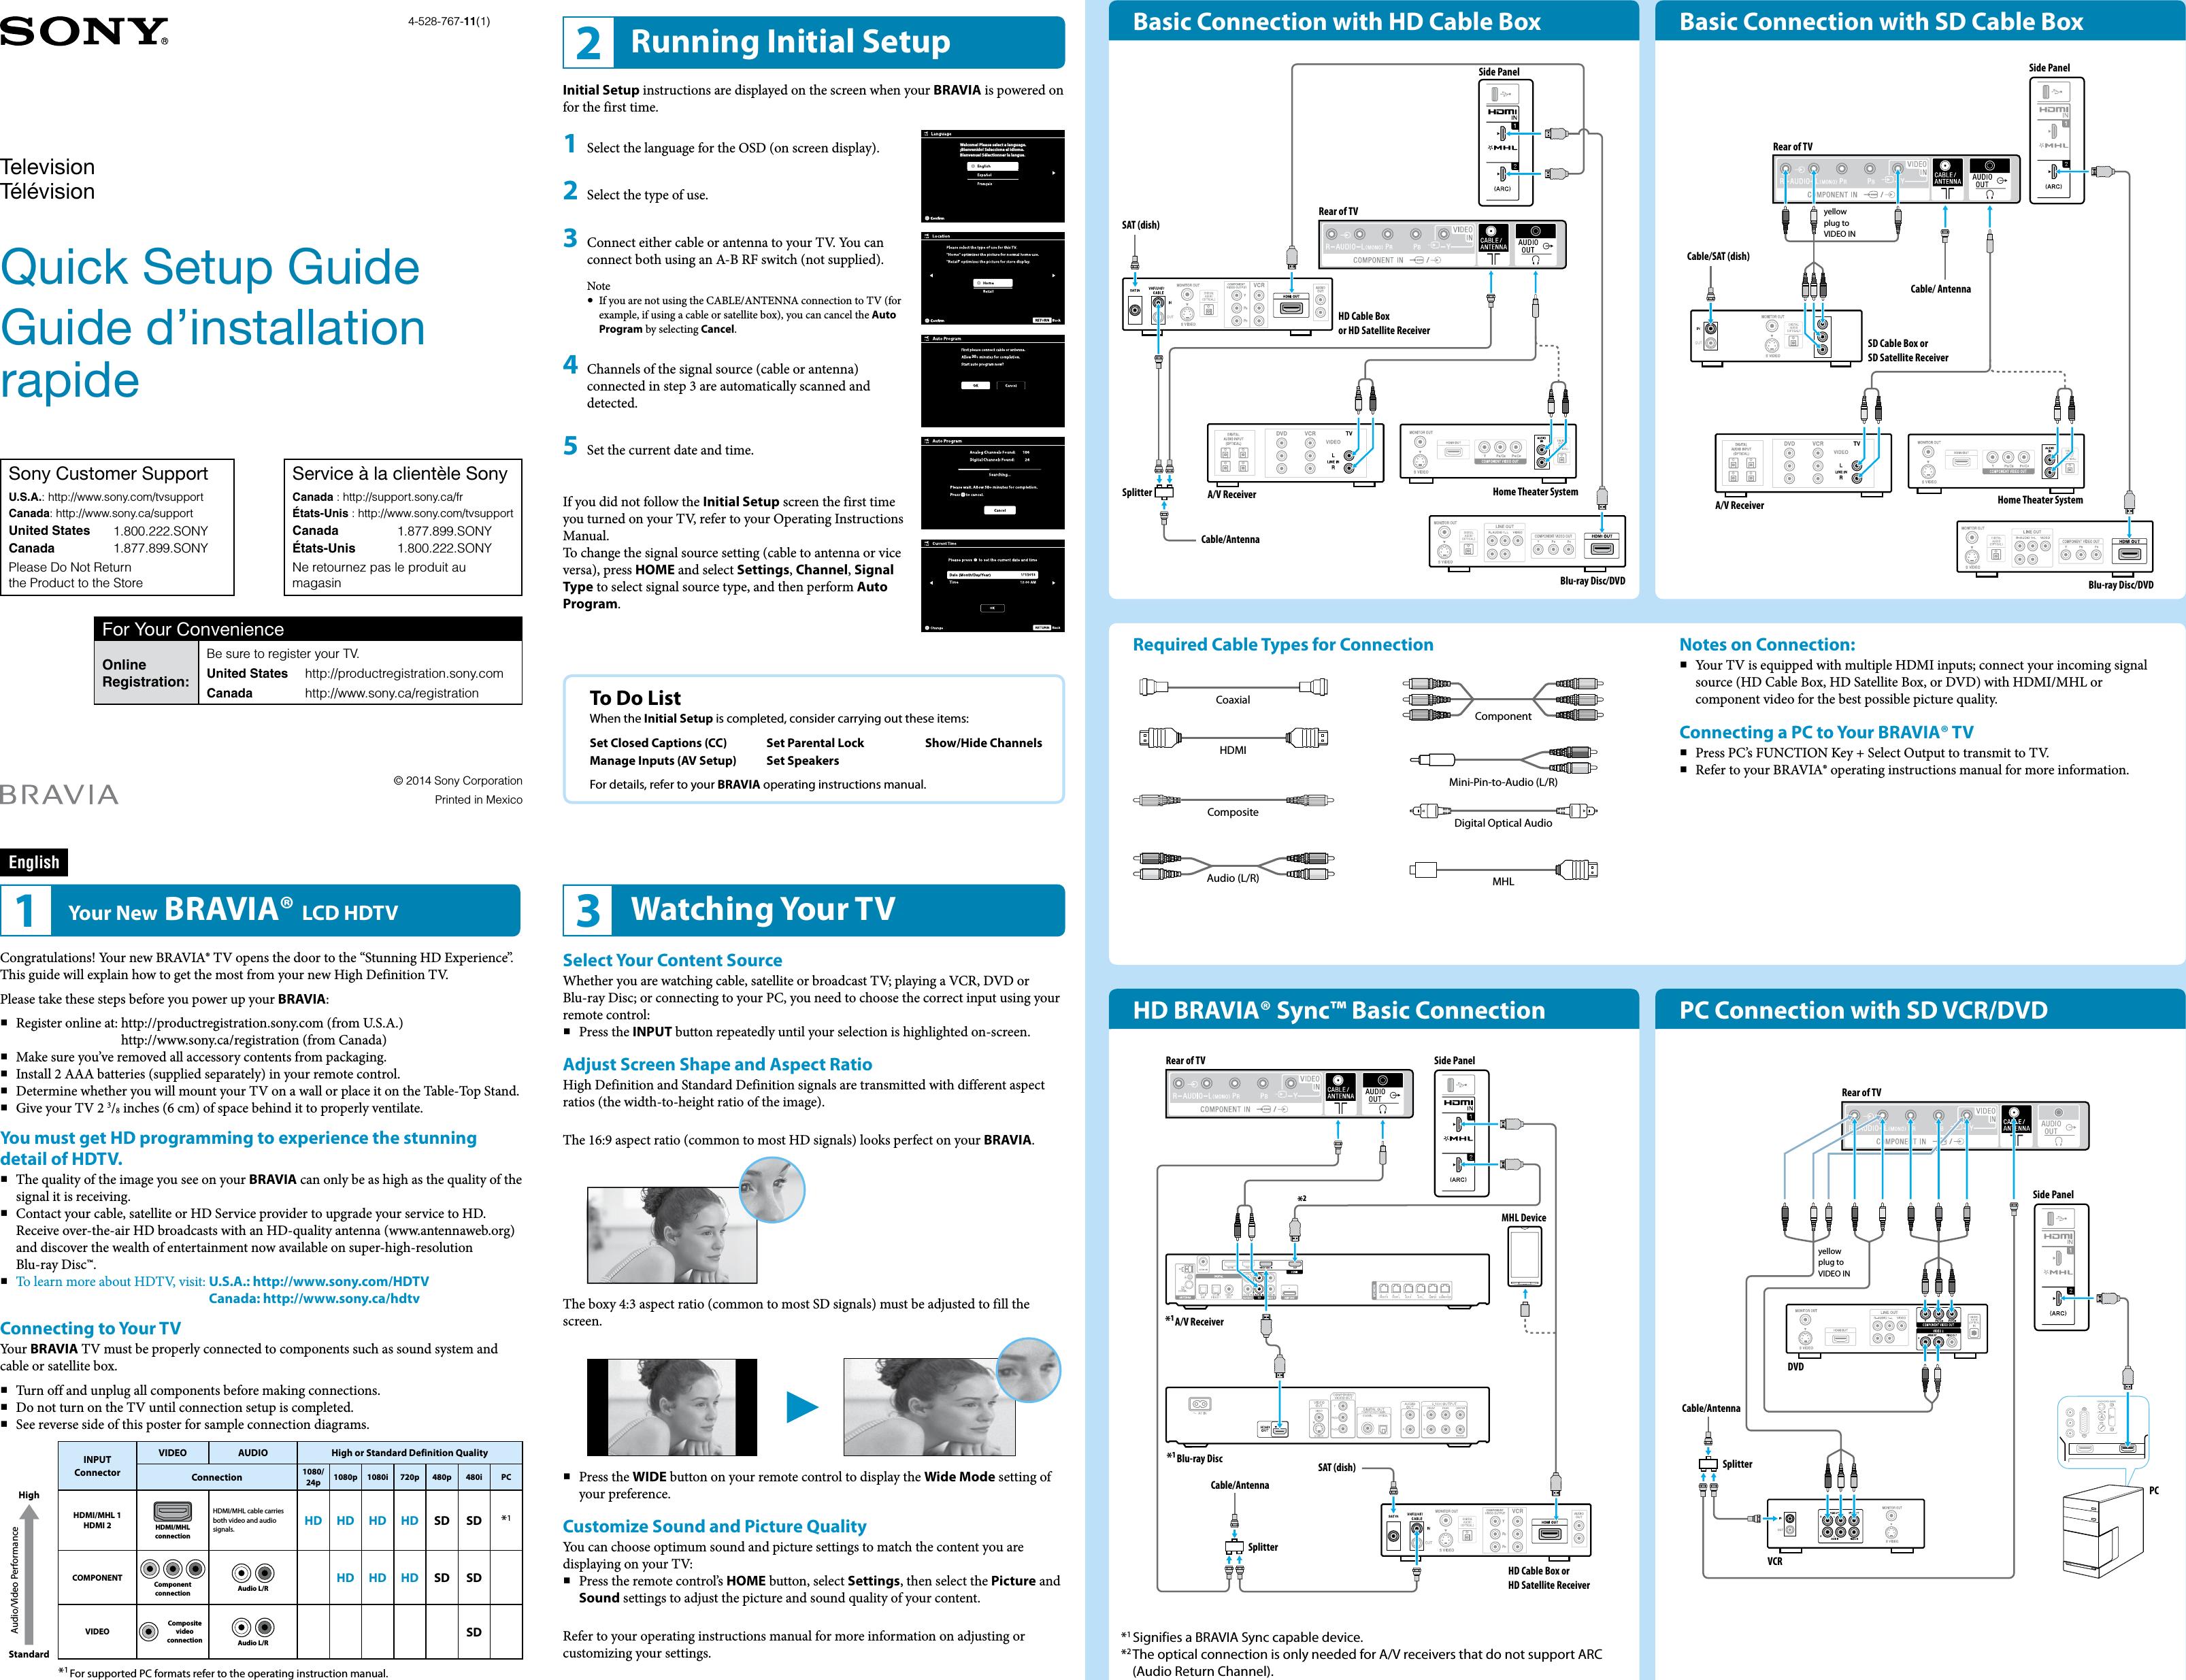 sony kdl 32r420b 48r470b 40r470b user manual quick setup guide rh usermanual wiki sony tv quick setup guide Microsoft Quick Guide